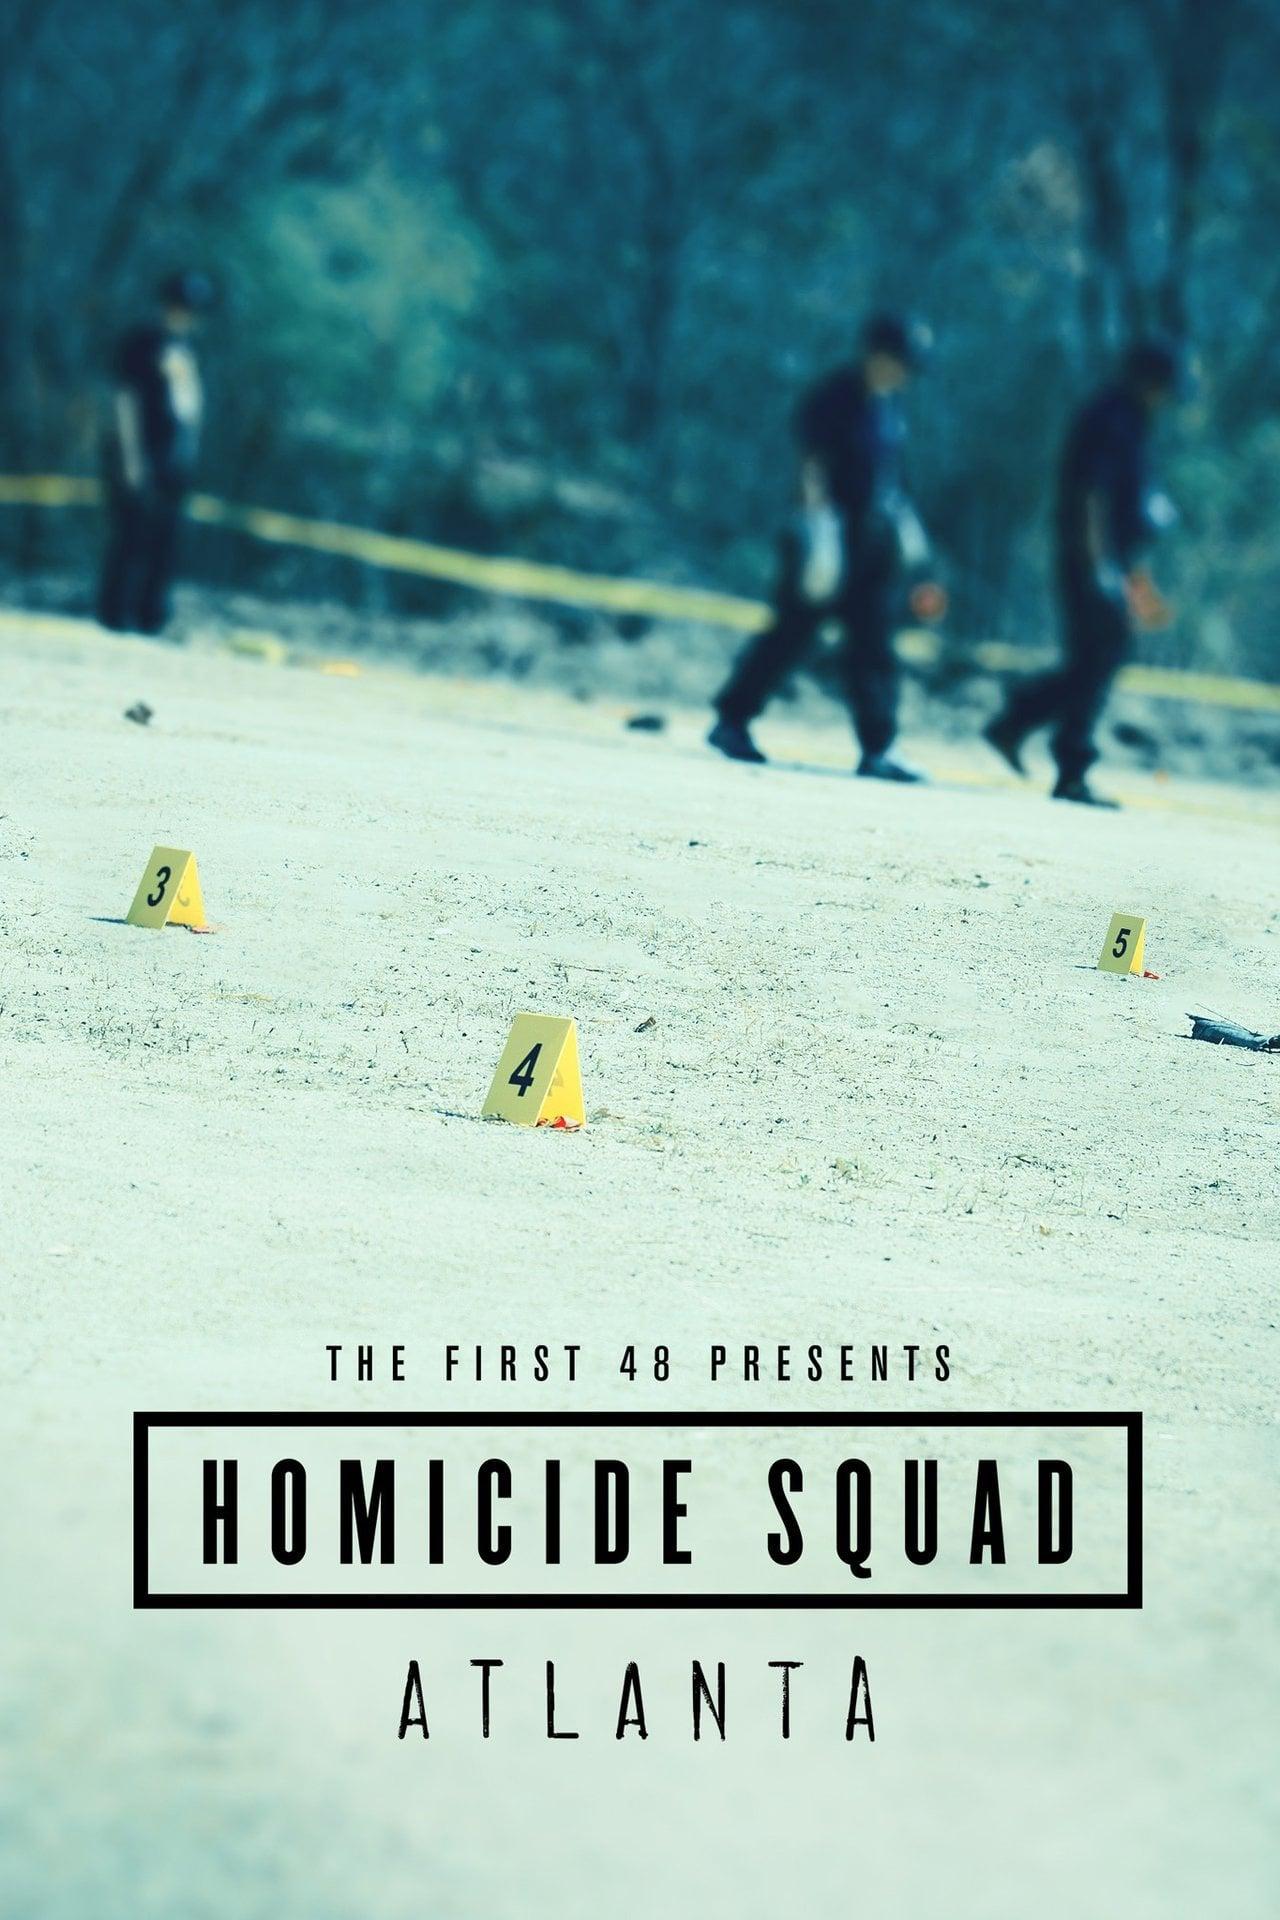 The First 48 Presents: Homicide Squad Atlanta (2019)